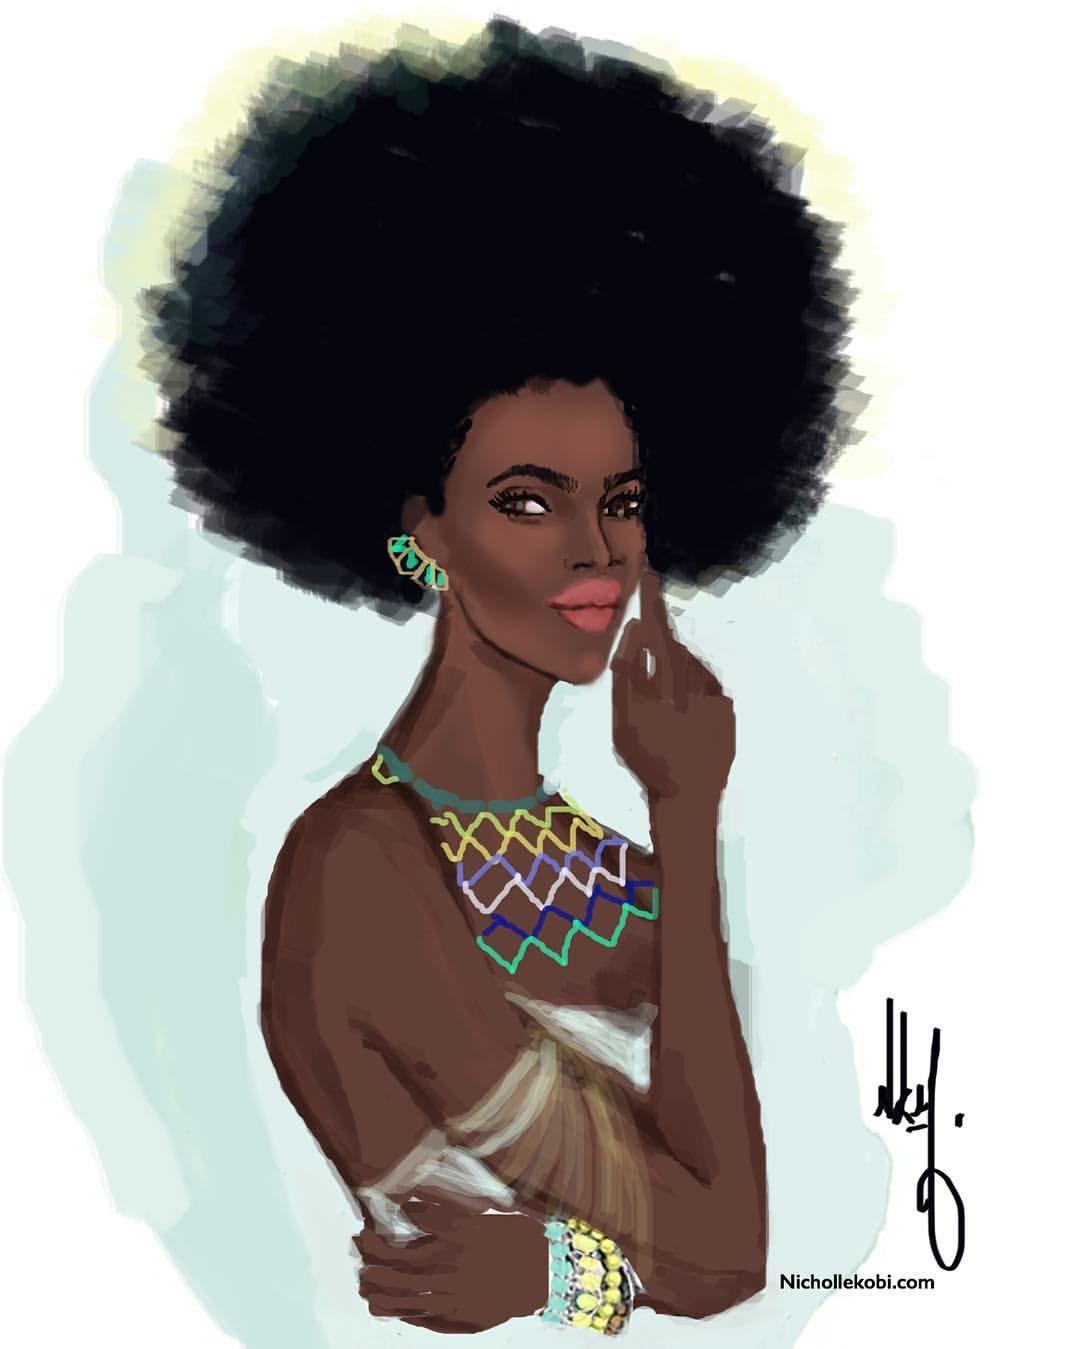 Be your own beauty standard  #nichollekobi #illustration